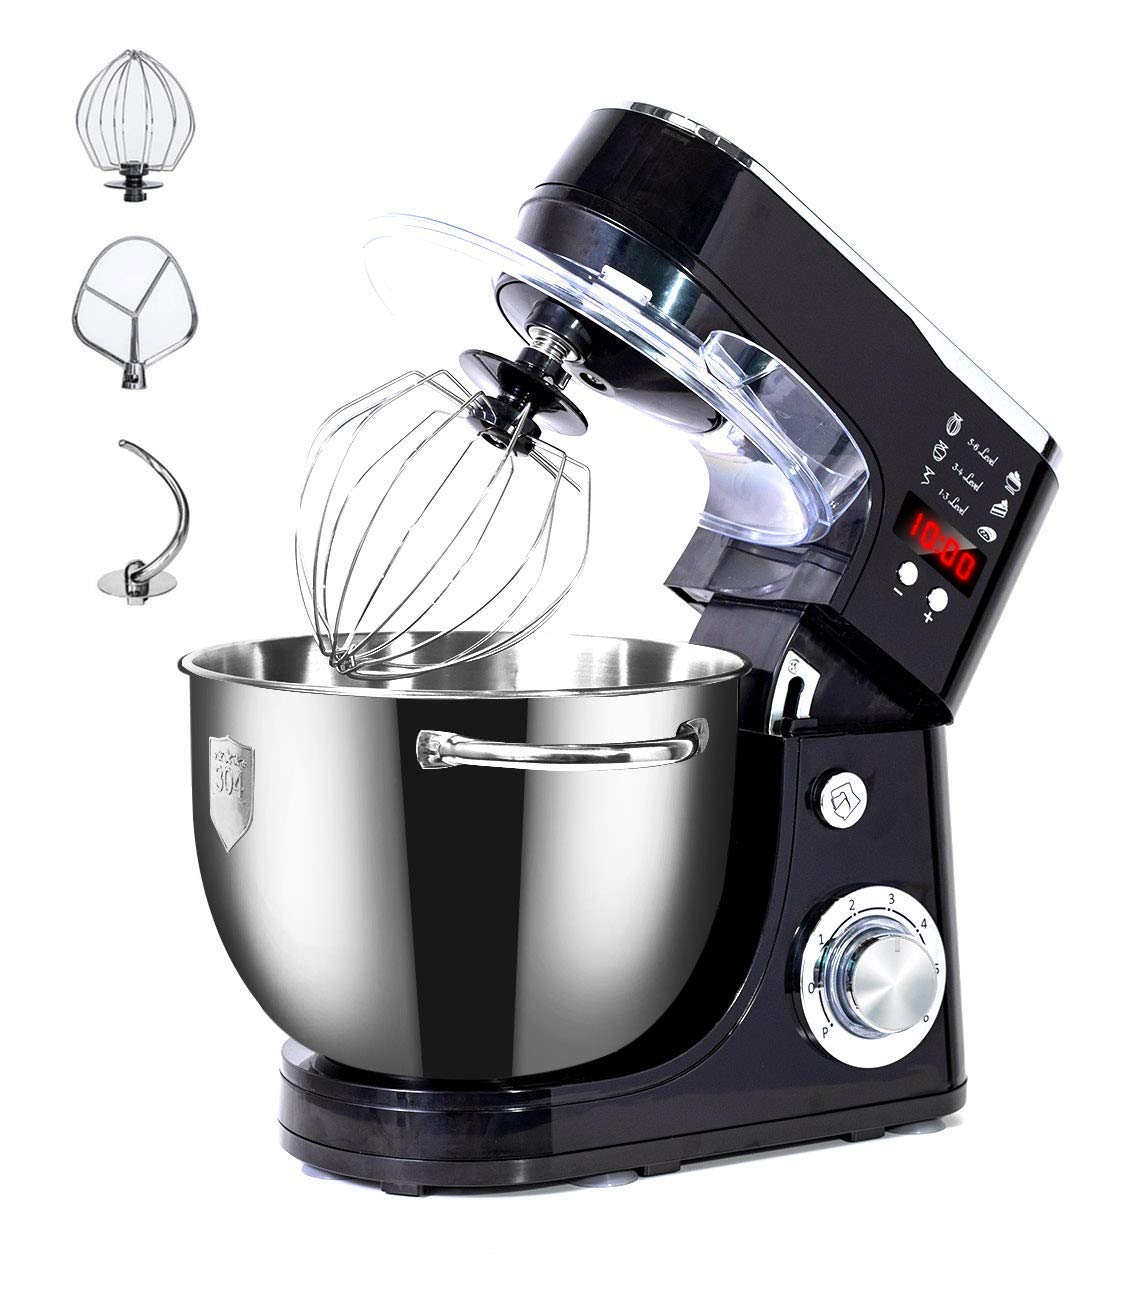 WantJoin Stand MixerProfessional dough machine with handlesKneading Dough mixer with TimerDigital display